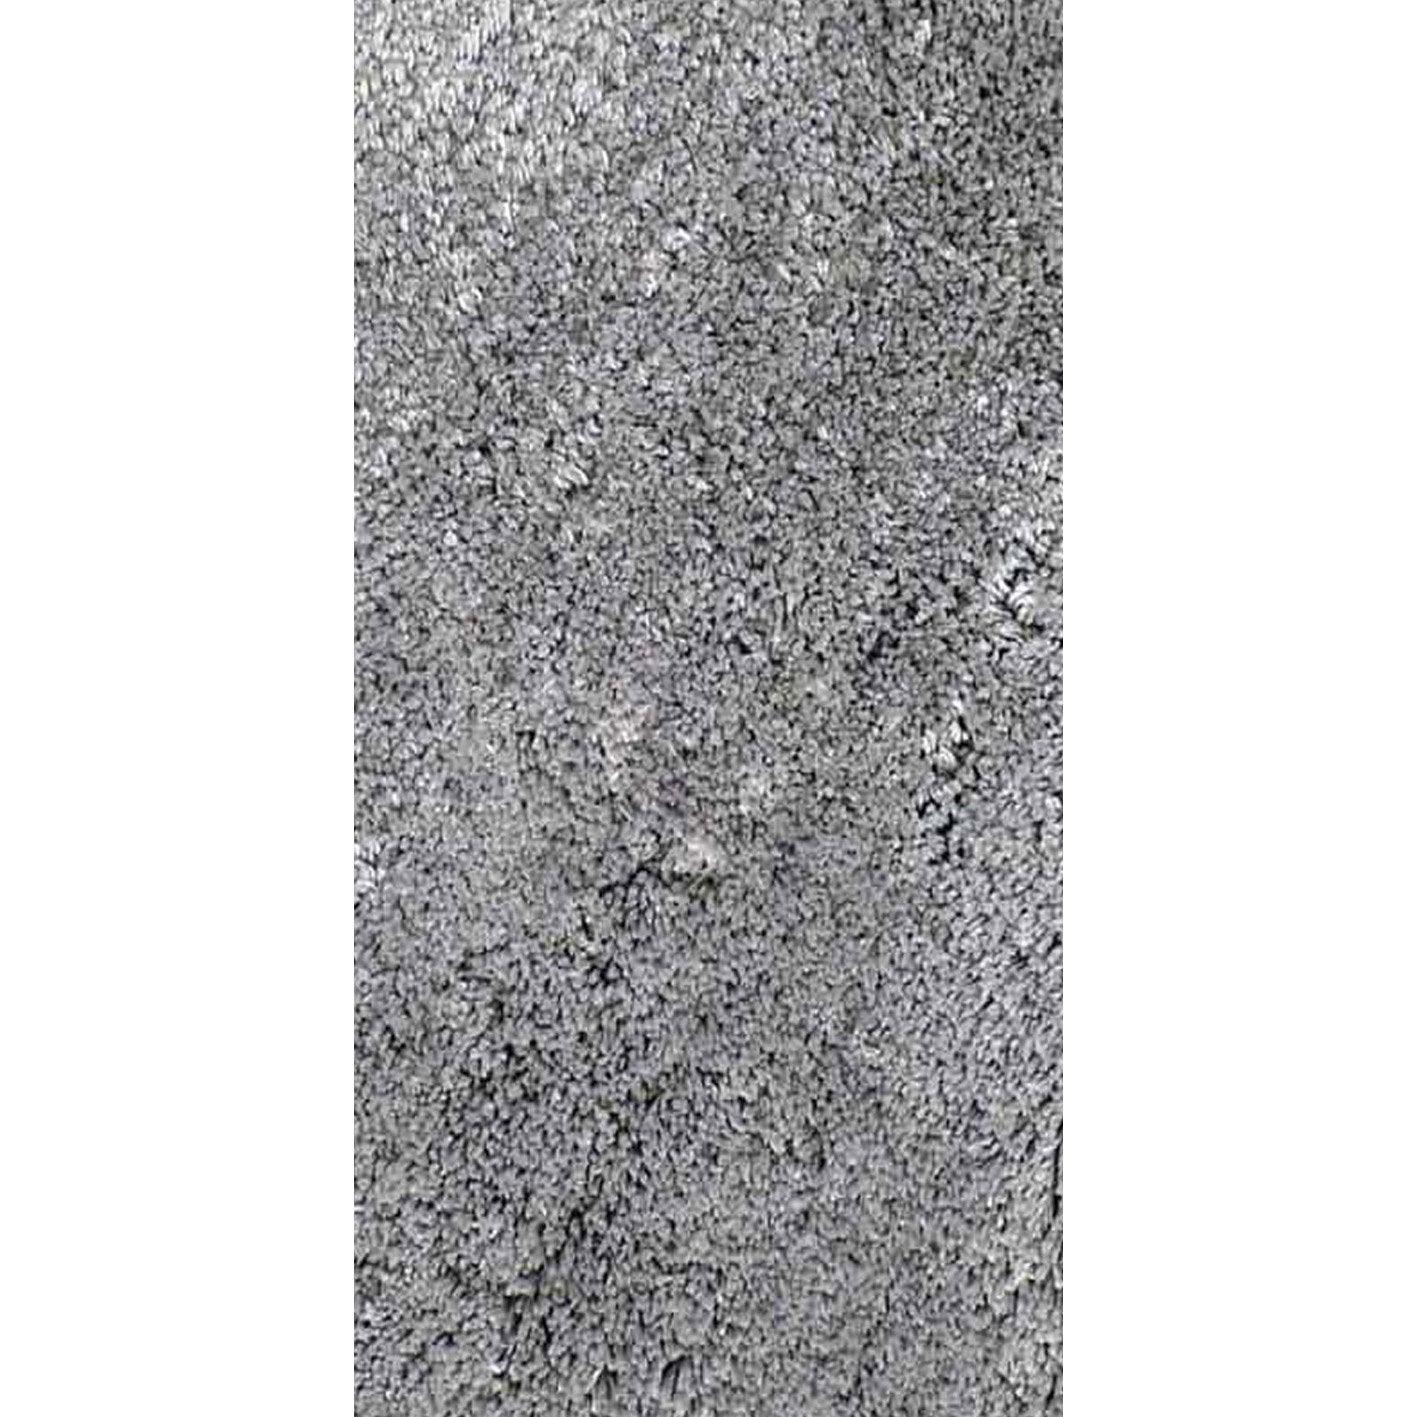 tapis gris shaggy agathe x cm leroy merlin. Black Bedroom Furniture Sets. Home Design Ideas